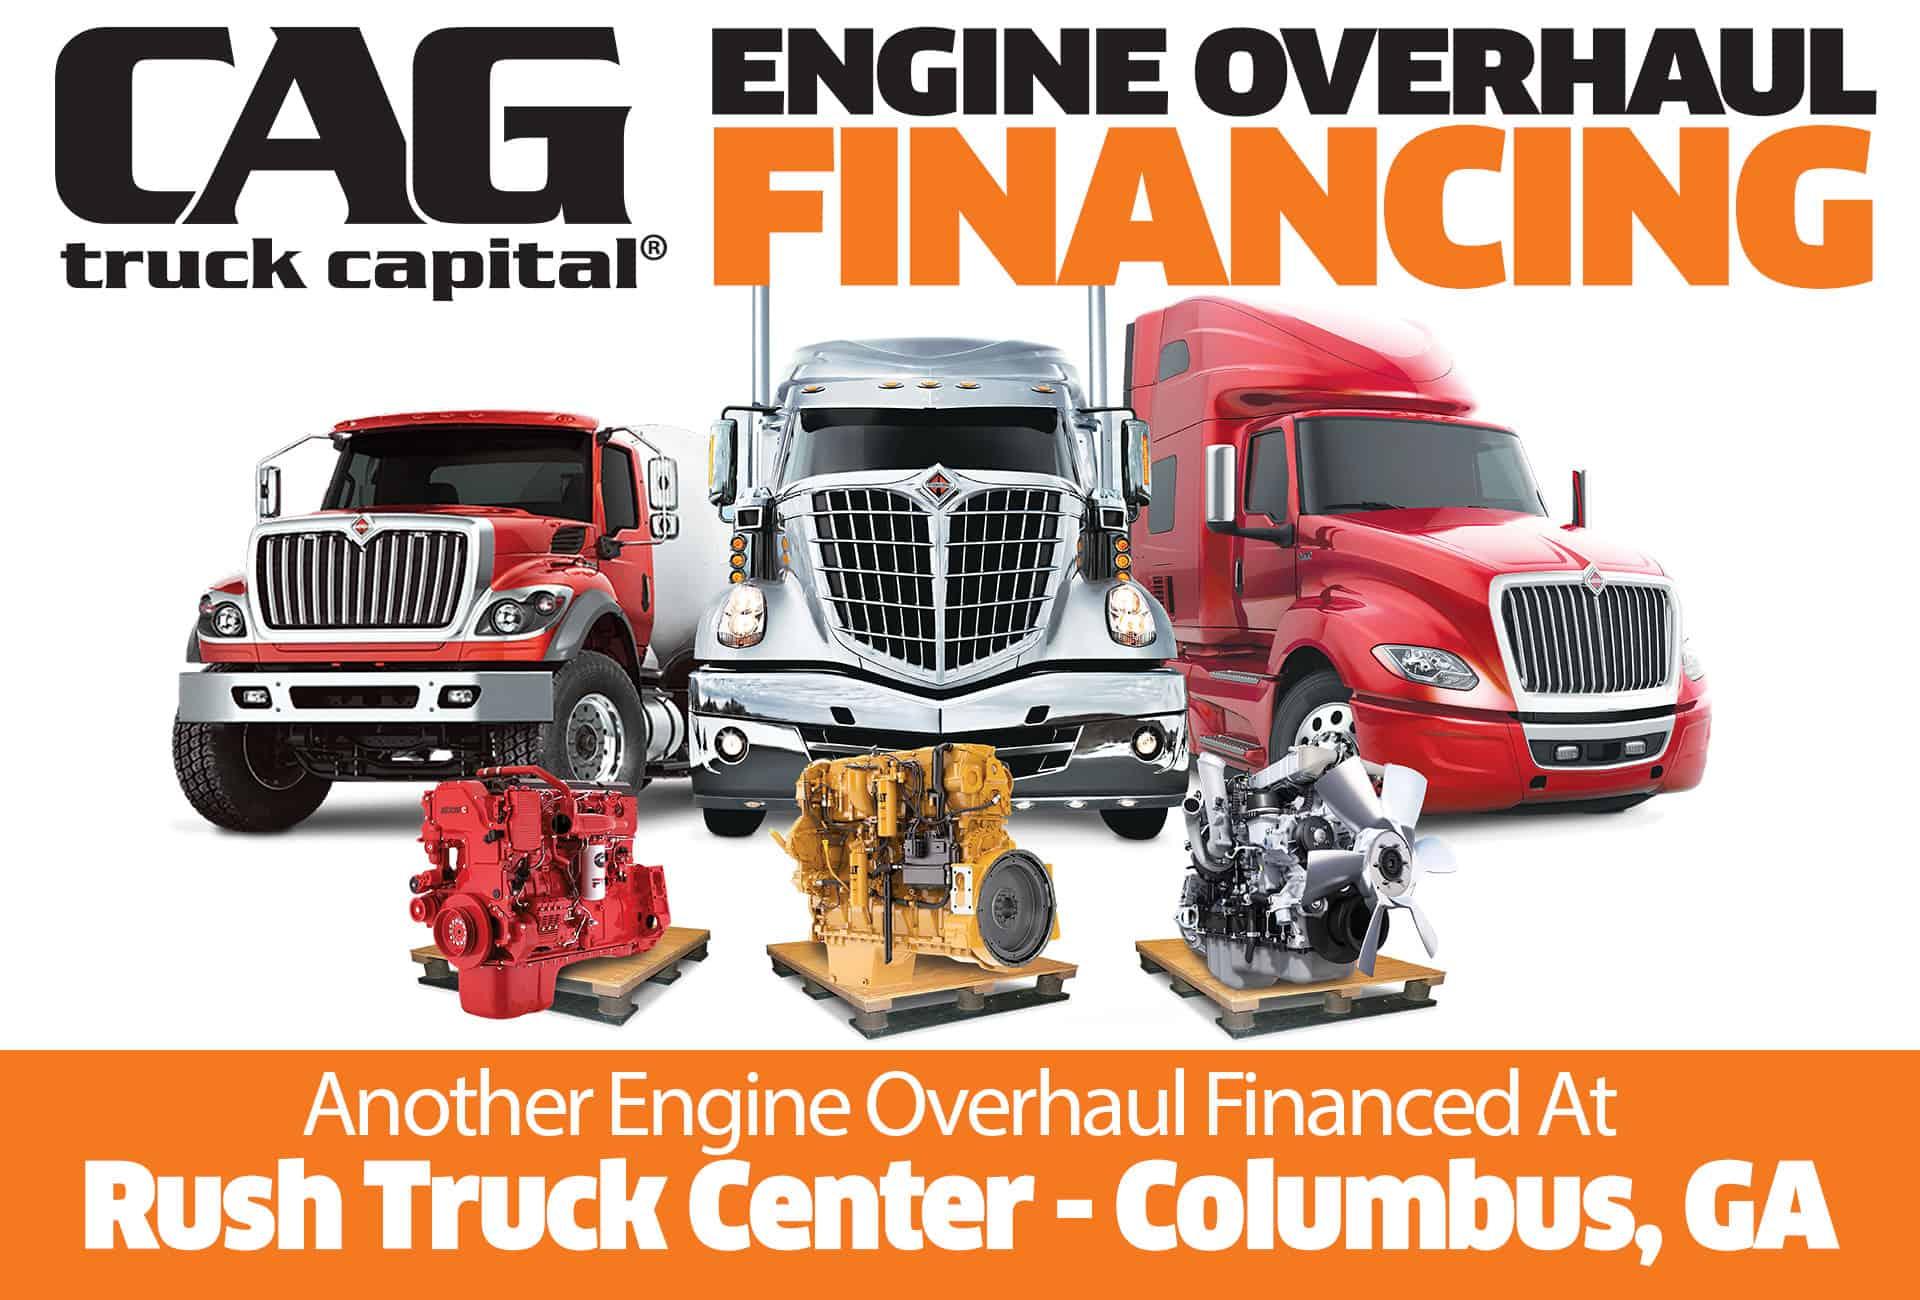 Rush Truck Center Columbus GA